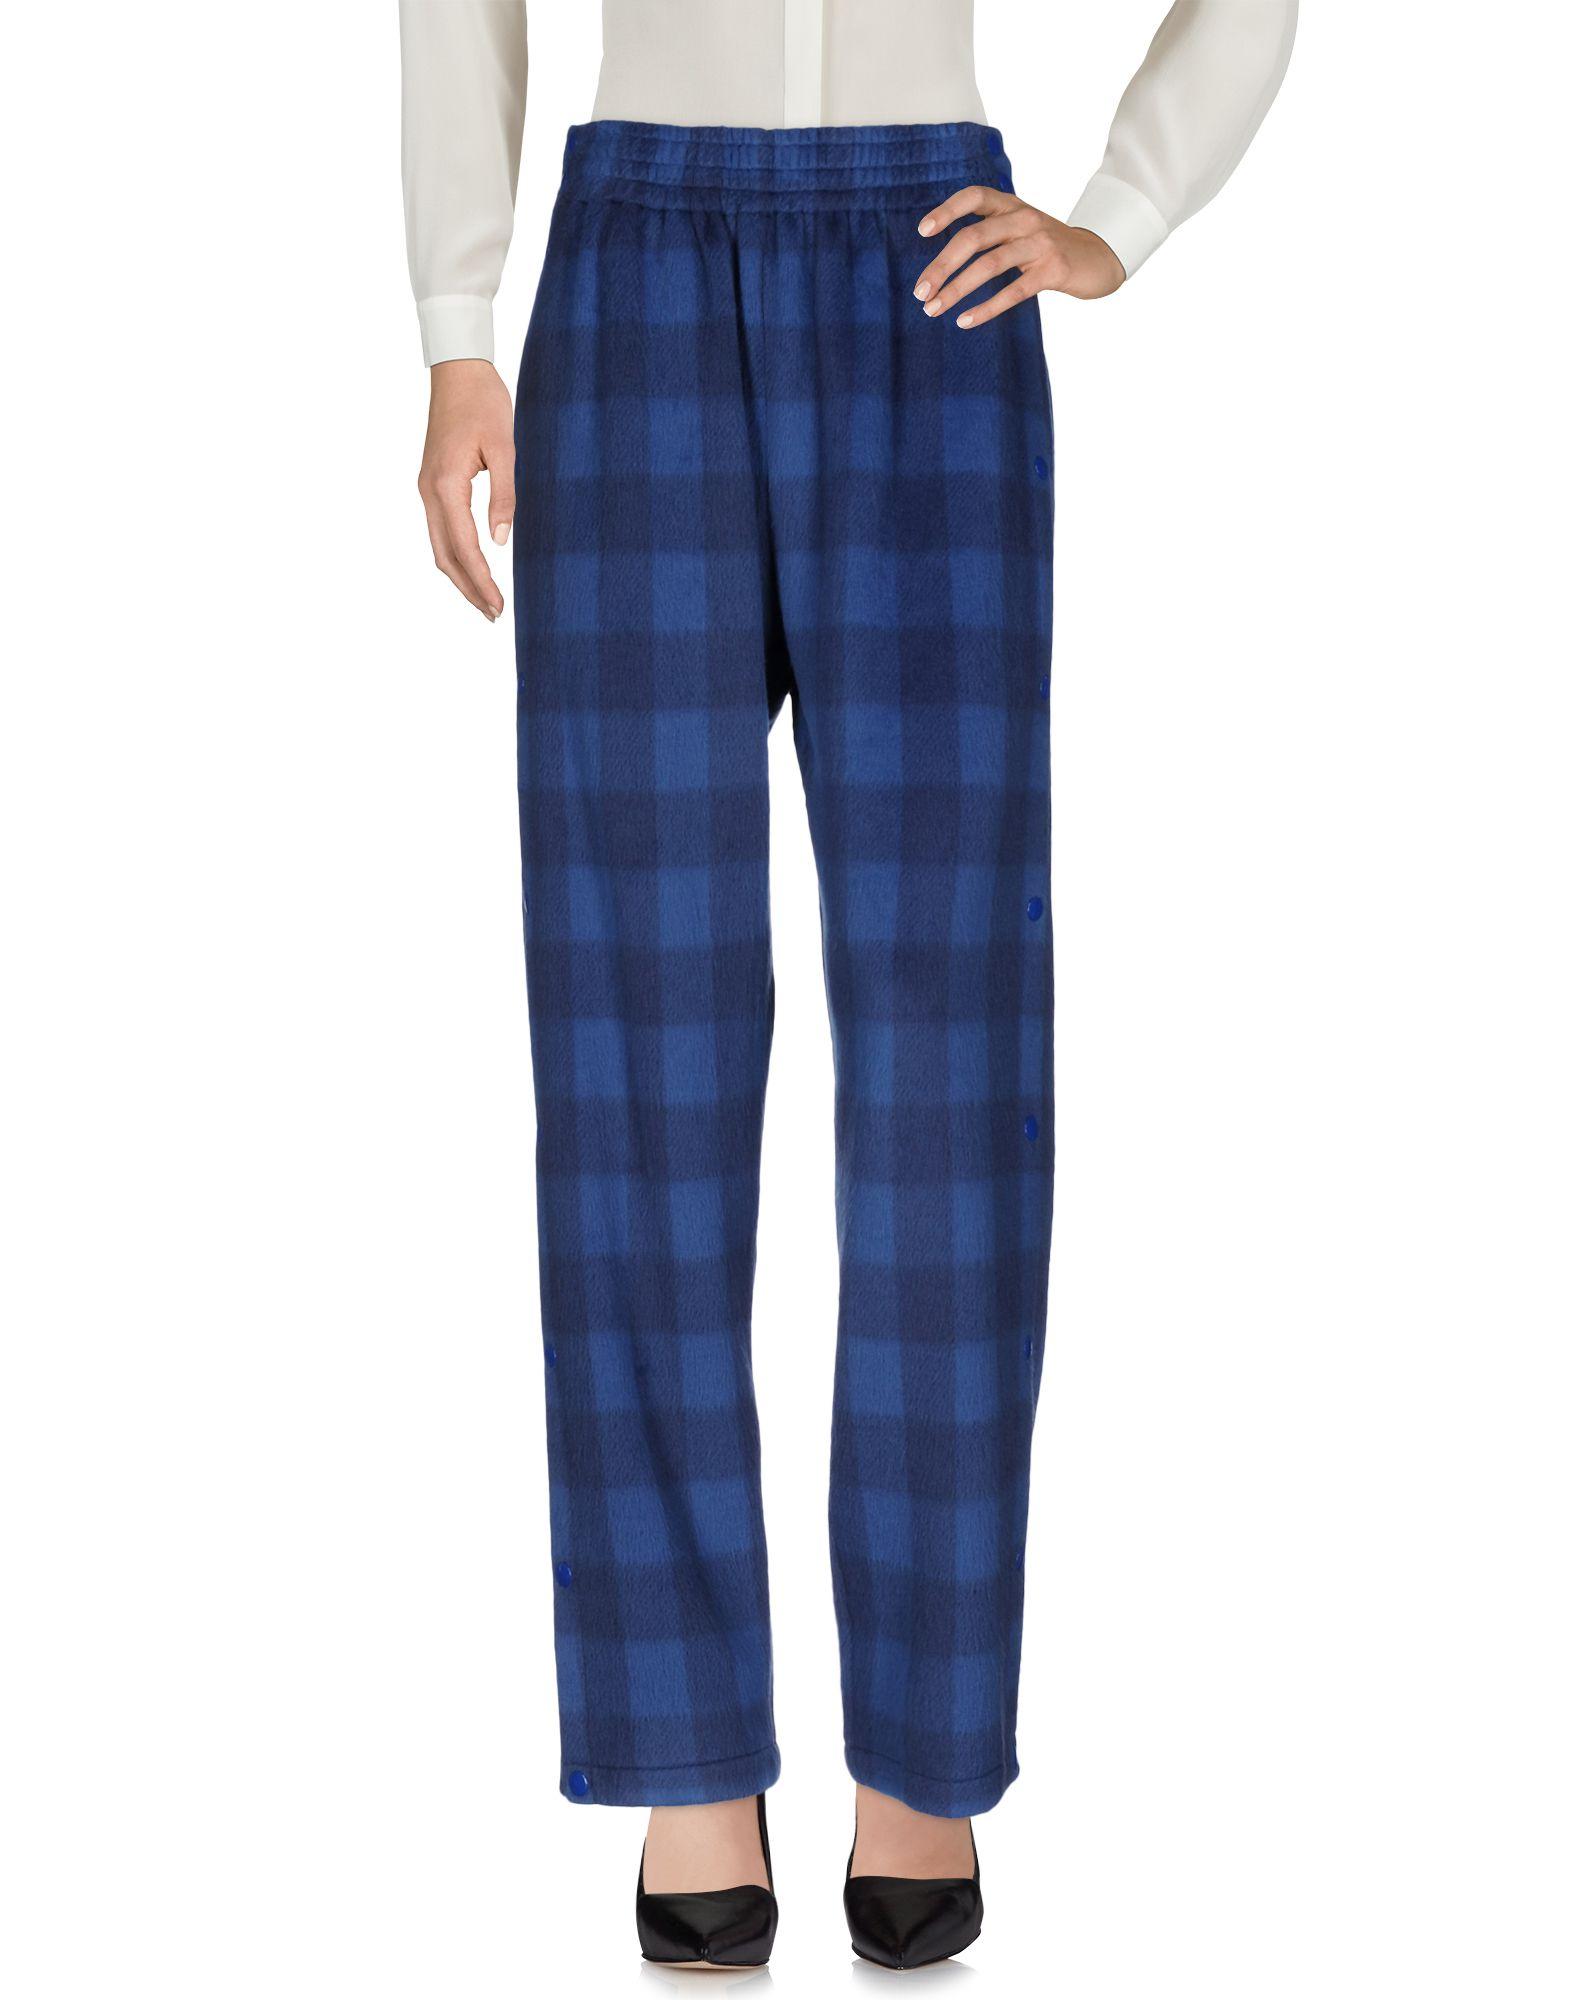 Pantalone Mm6 Maison Margiela Donna - Acquista online su t6c5o